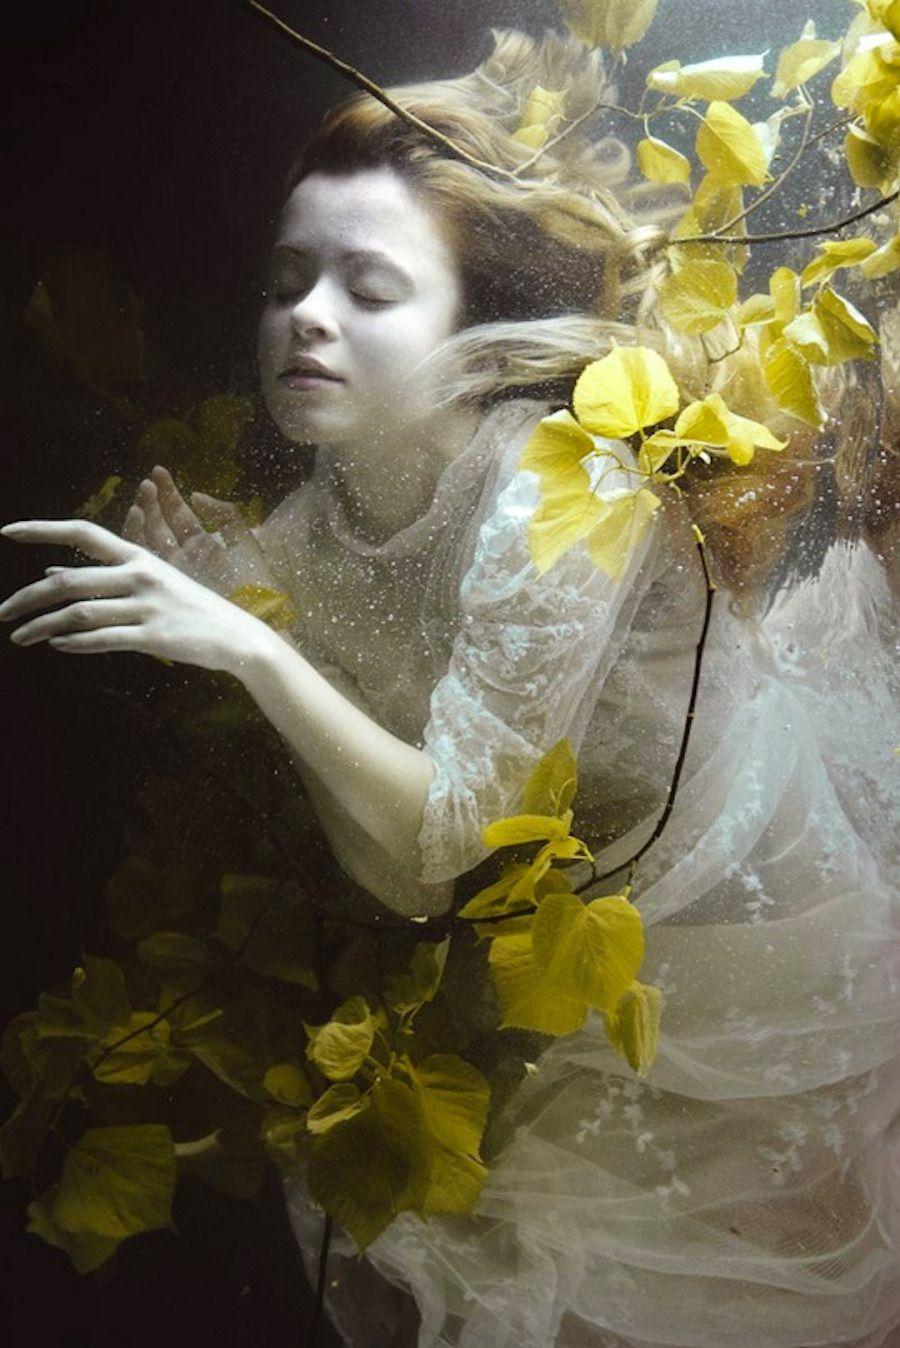 miraned21 in 2020 Underwater photography, Female